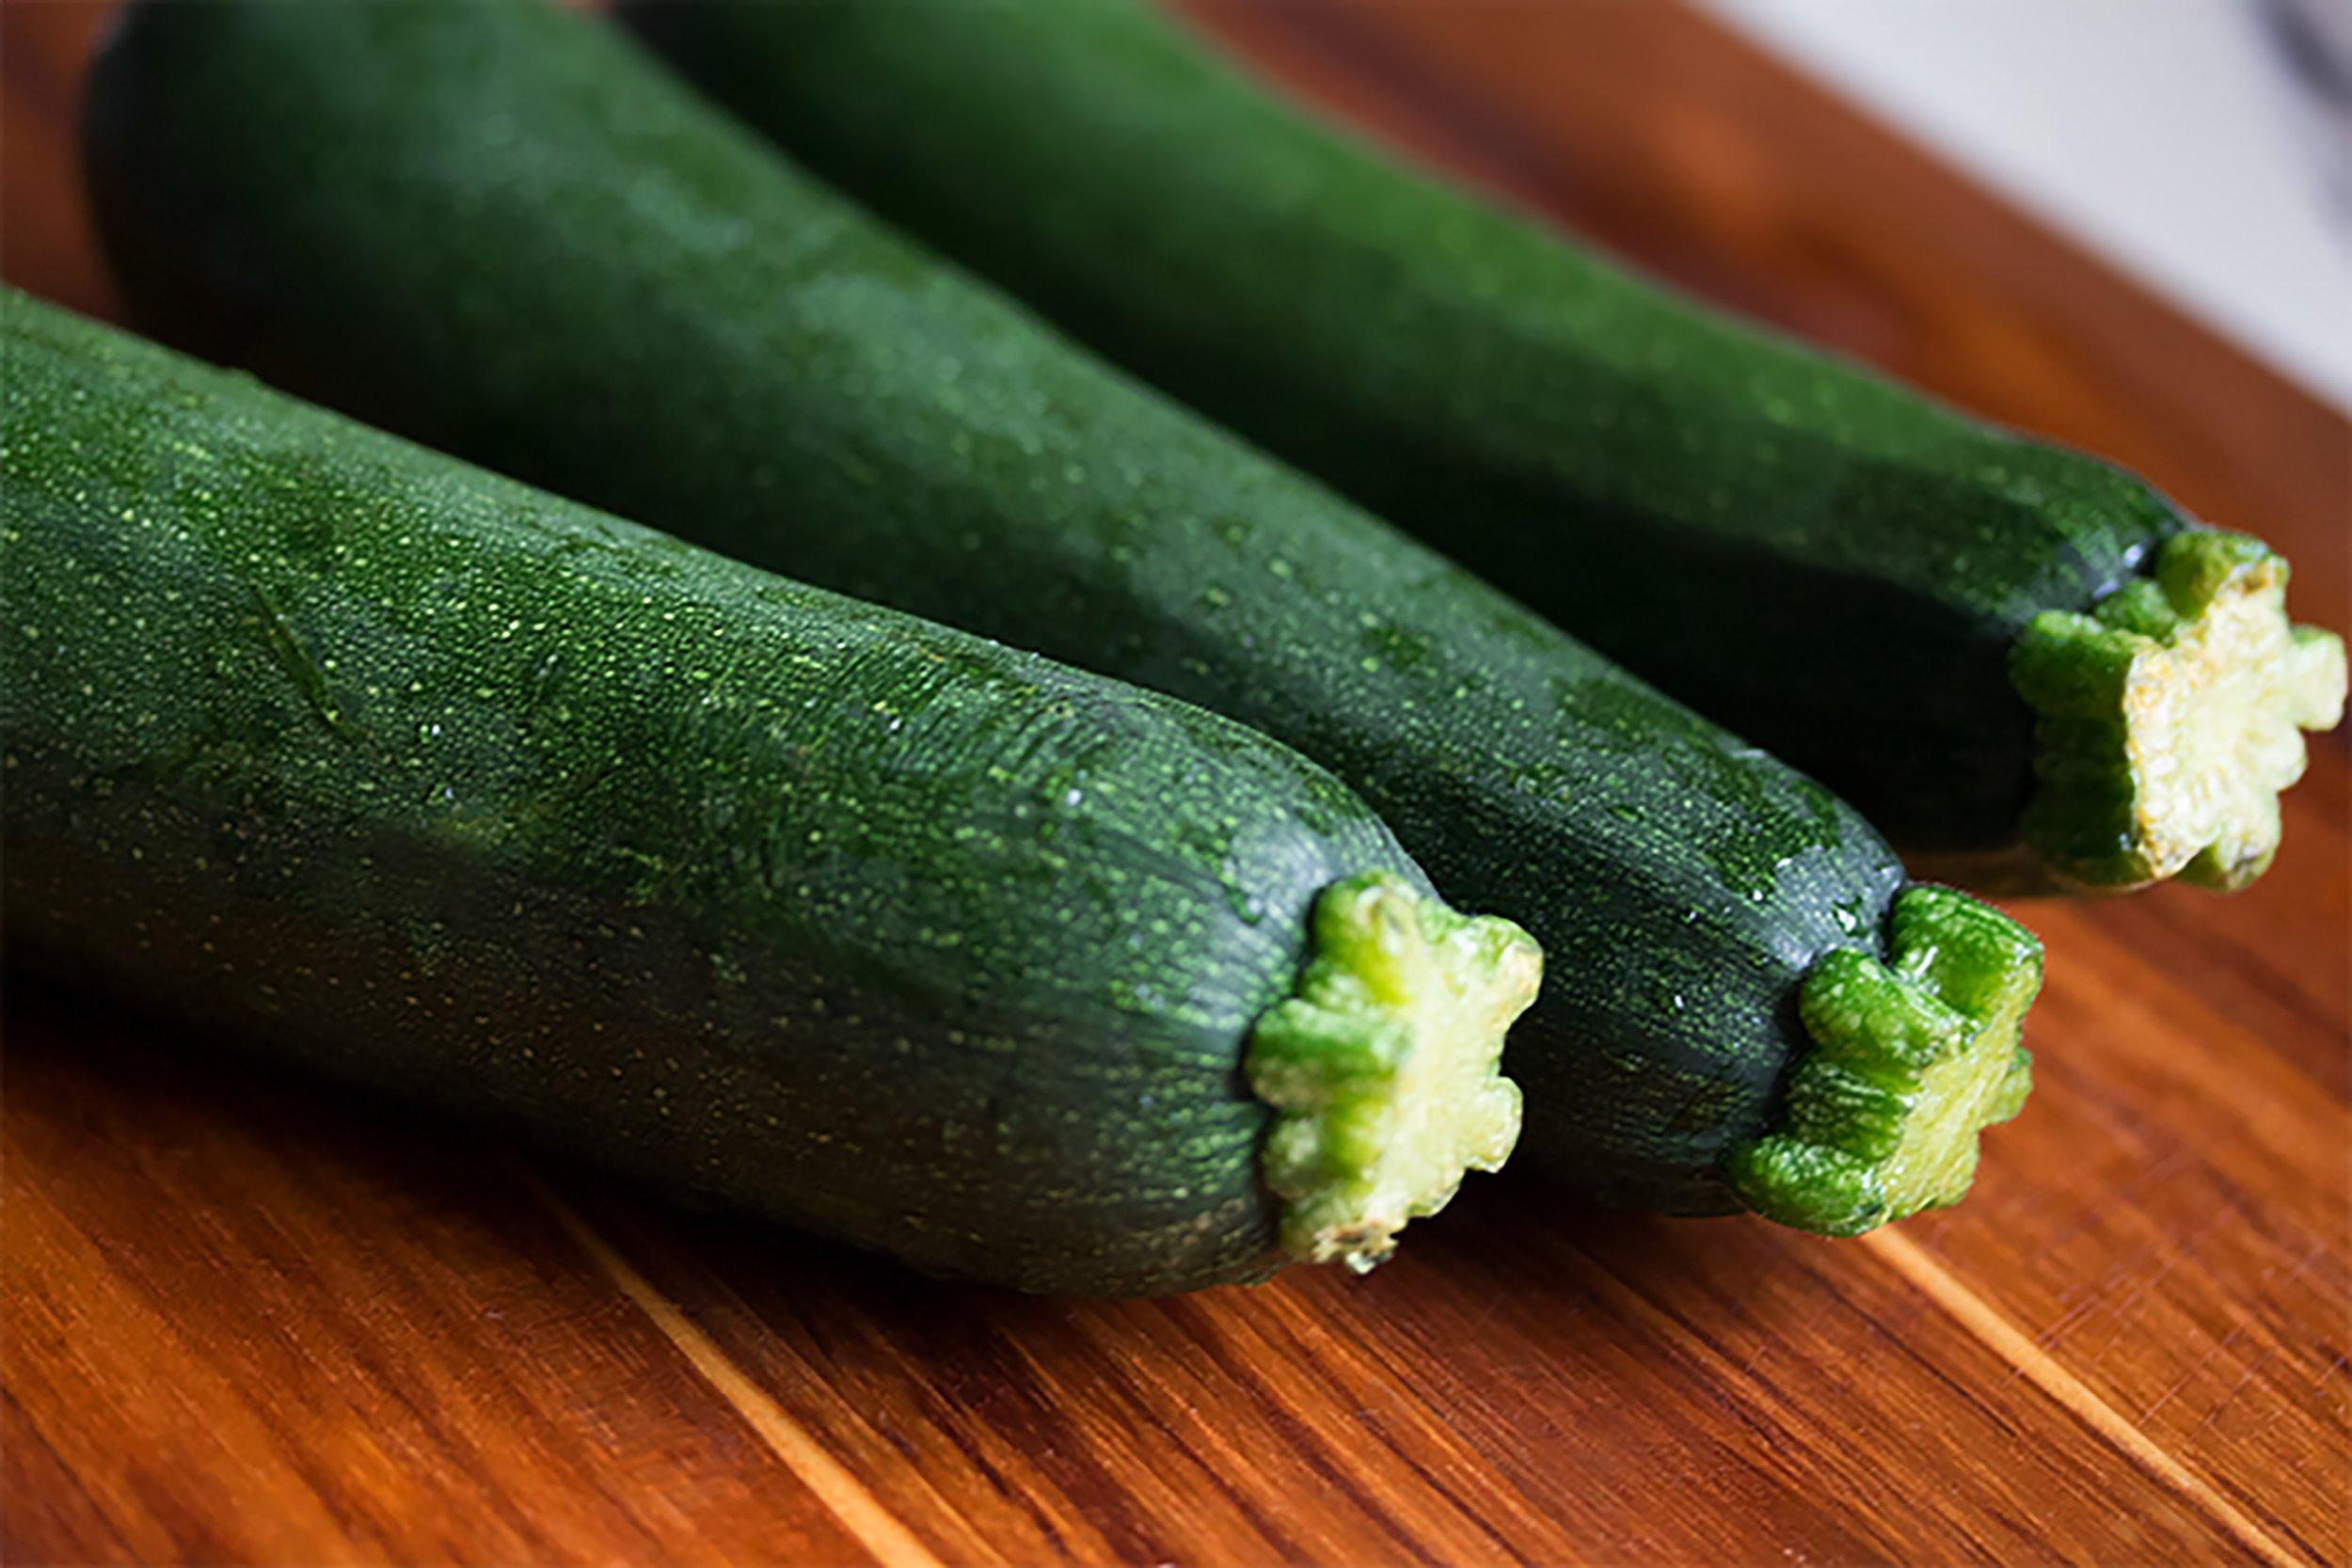 courgette-cucumber-food-128420.jpg